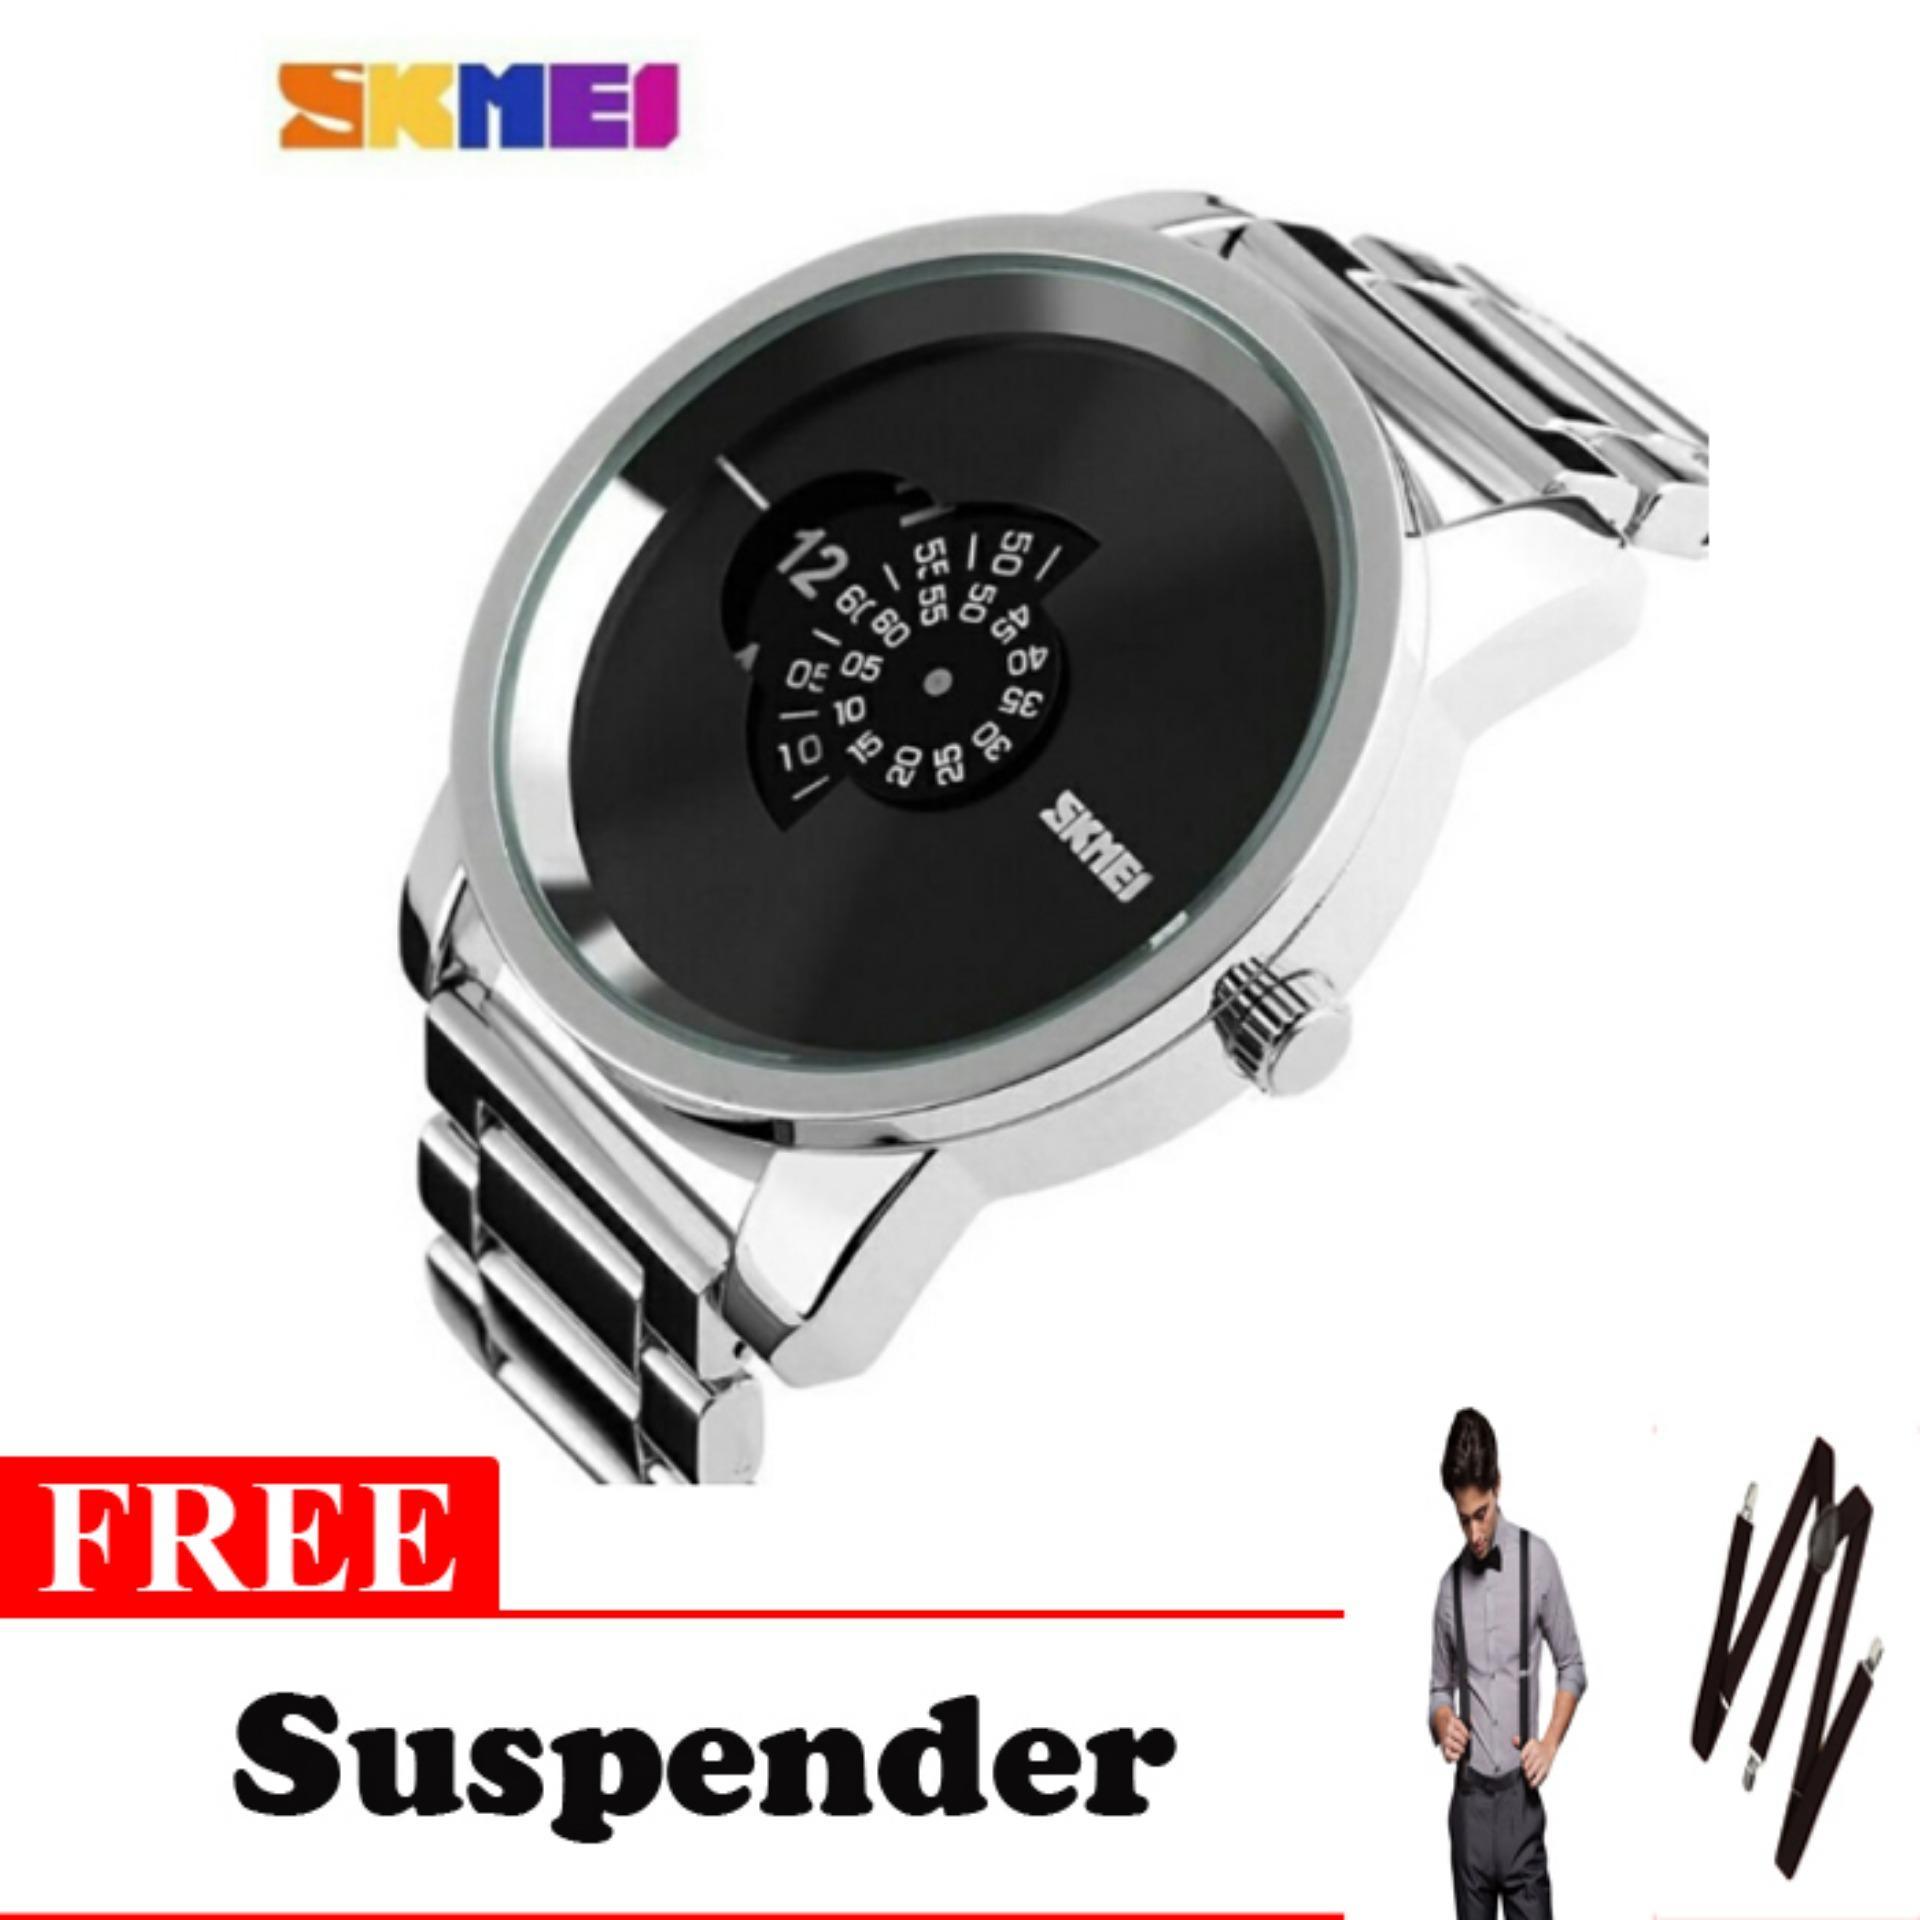 SKMEI Casio Man Sport LED Watch Water Resistant 30m - AD1171 - Black free Suspender Keren